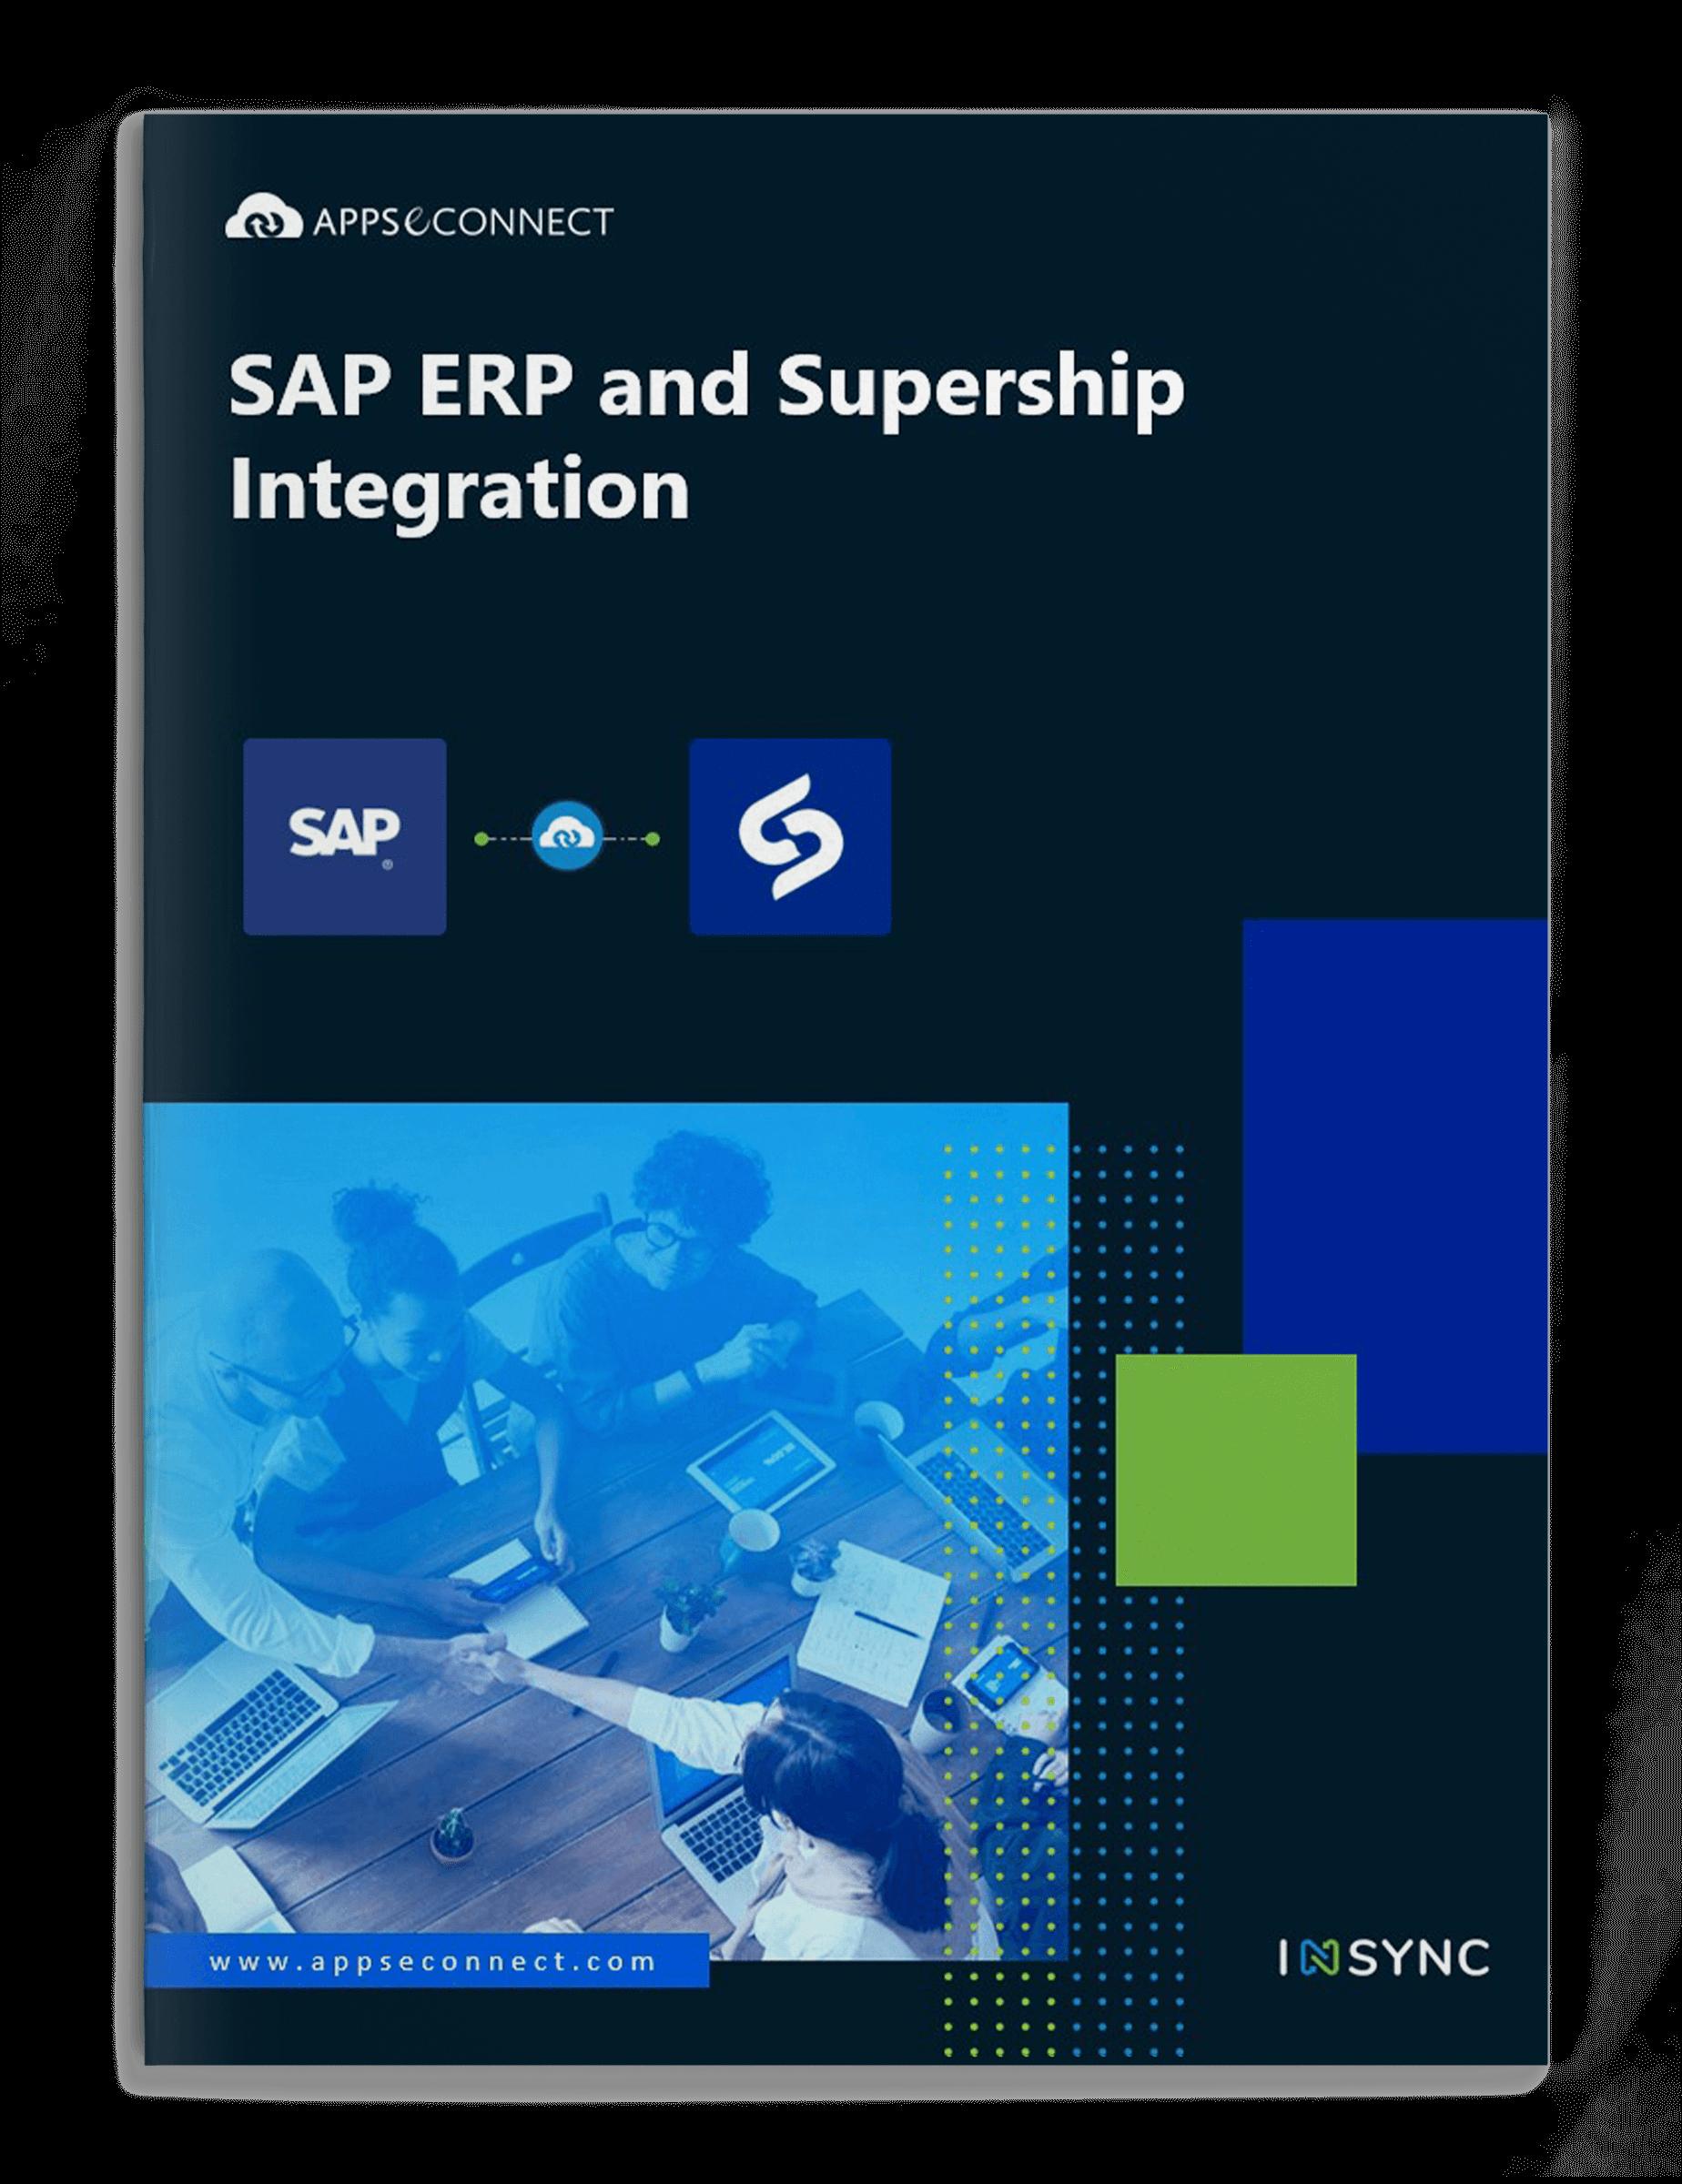 sap-erp-supership-integration-brochure-cover